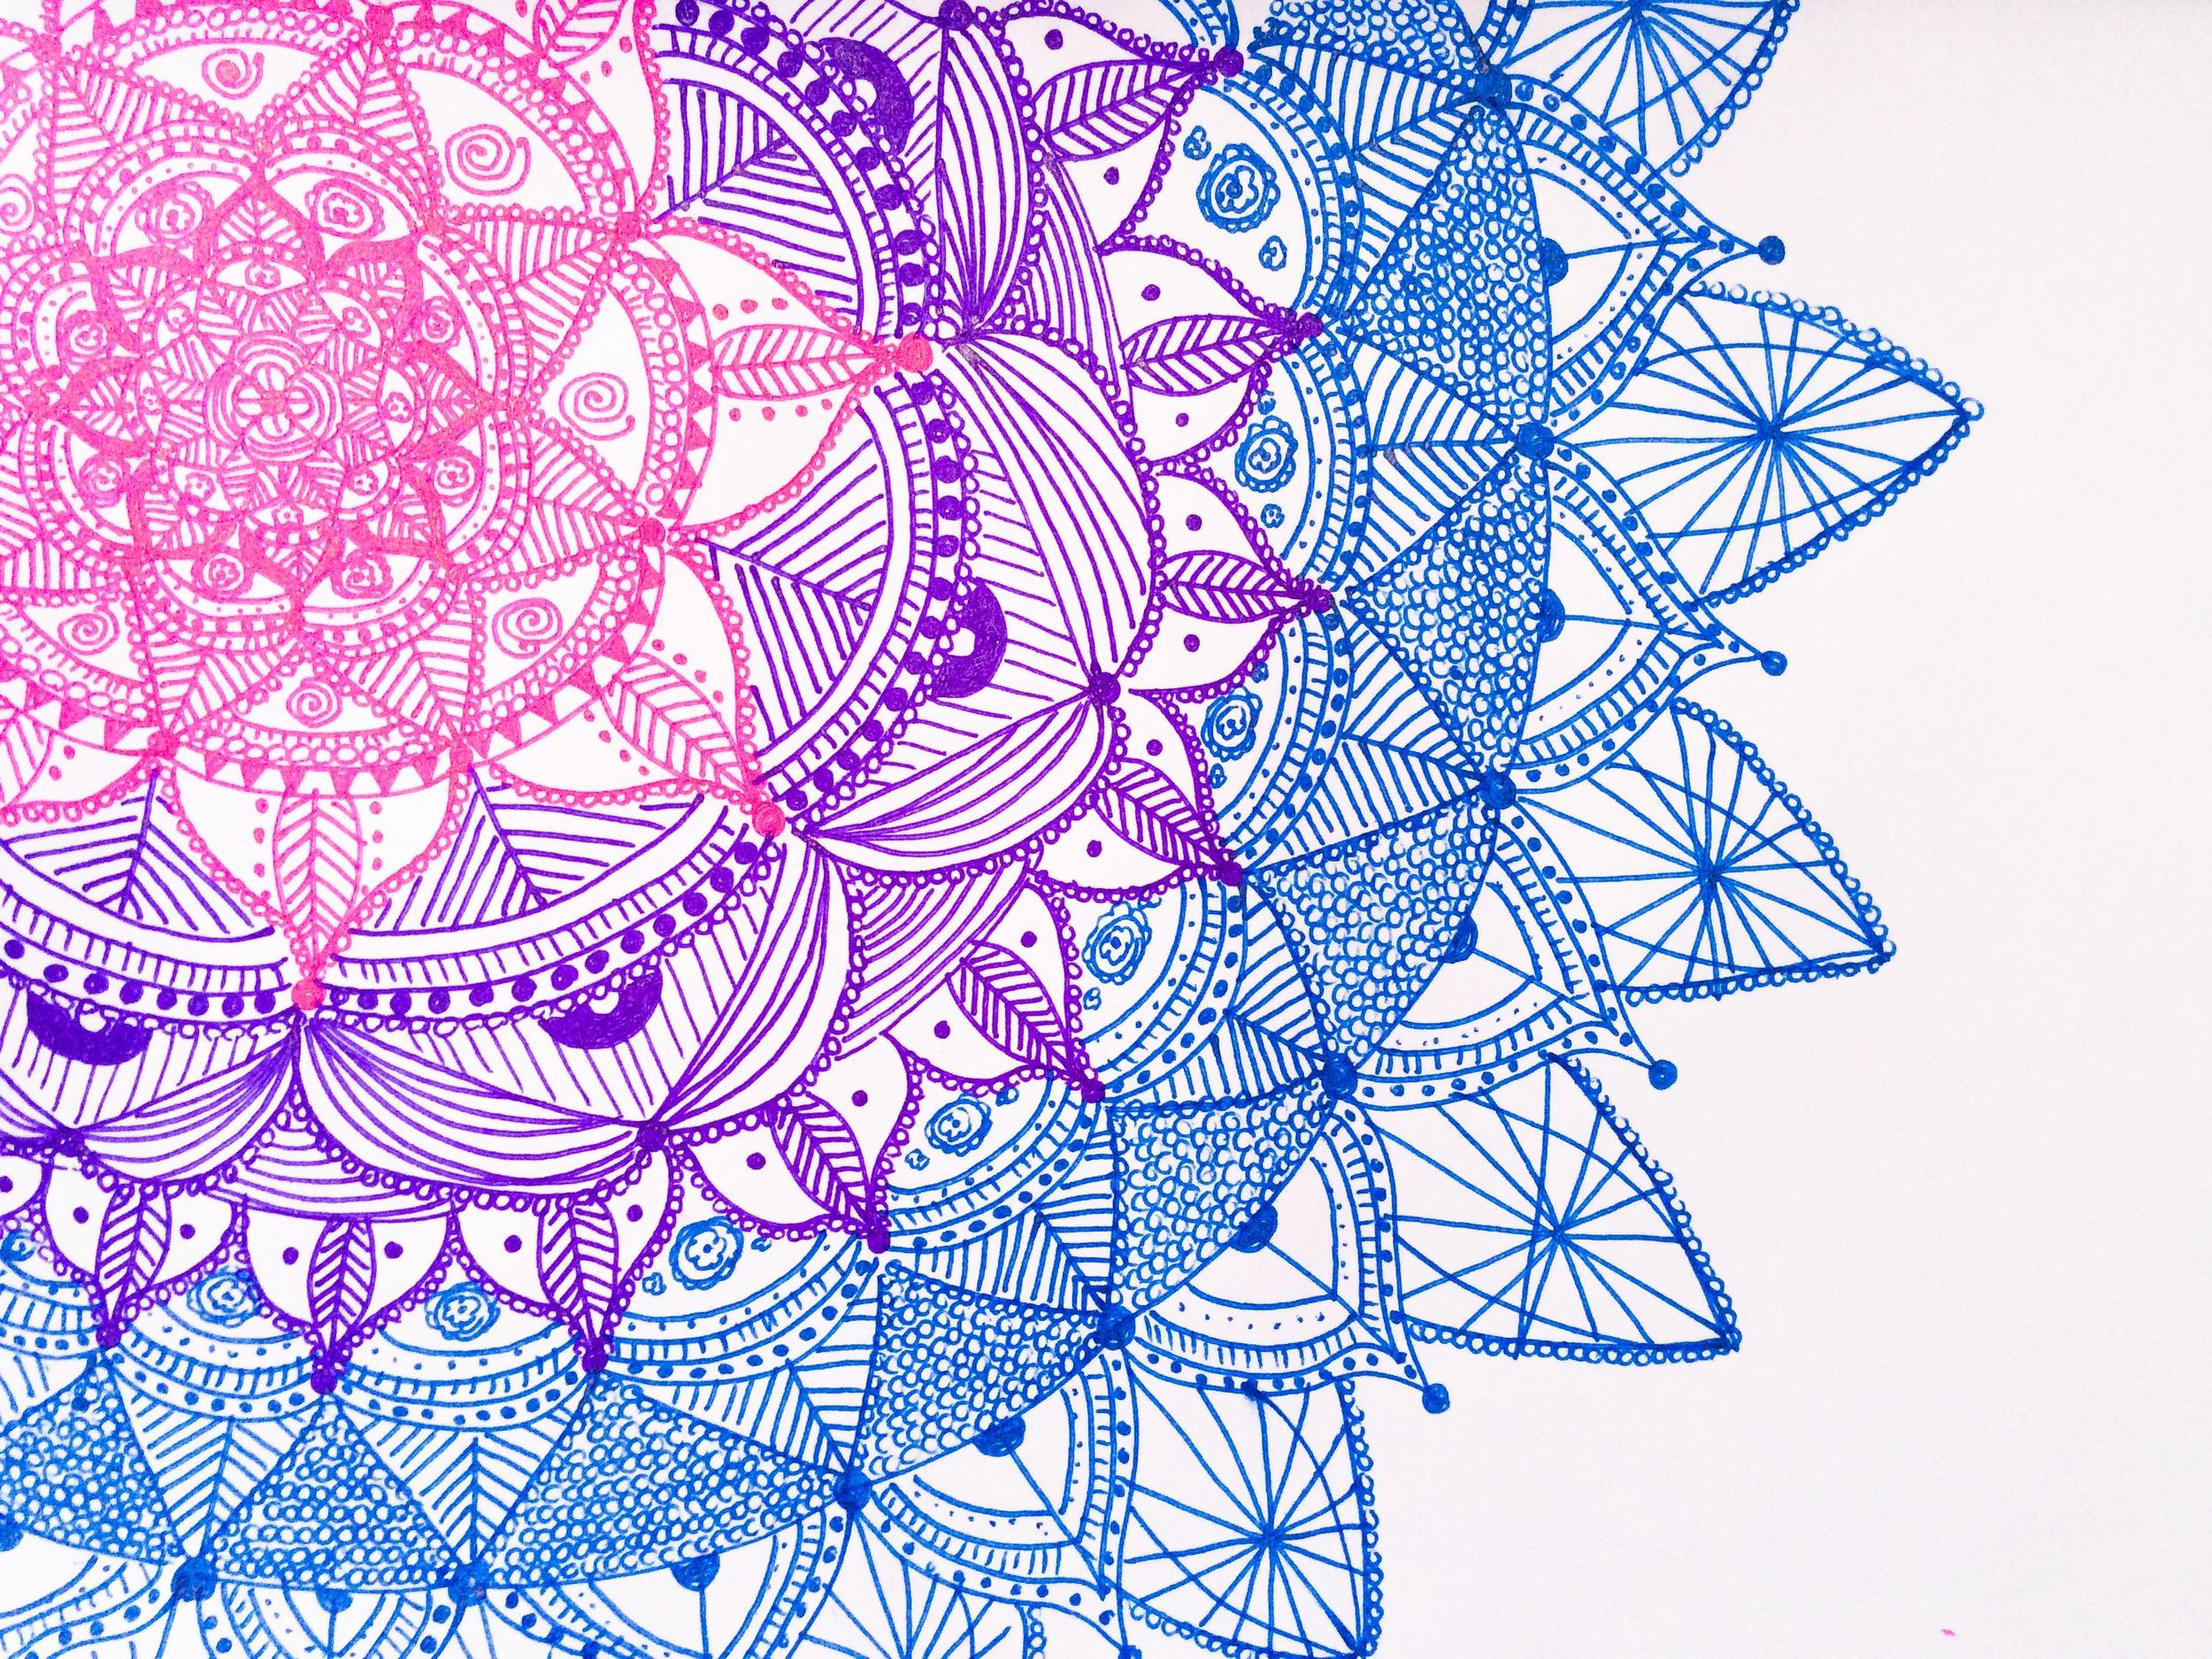 Violet Flower Hd Wallpaper A Mandala A Day Adriana Porras